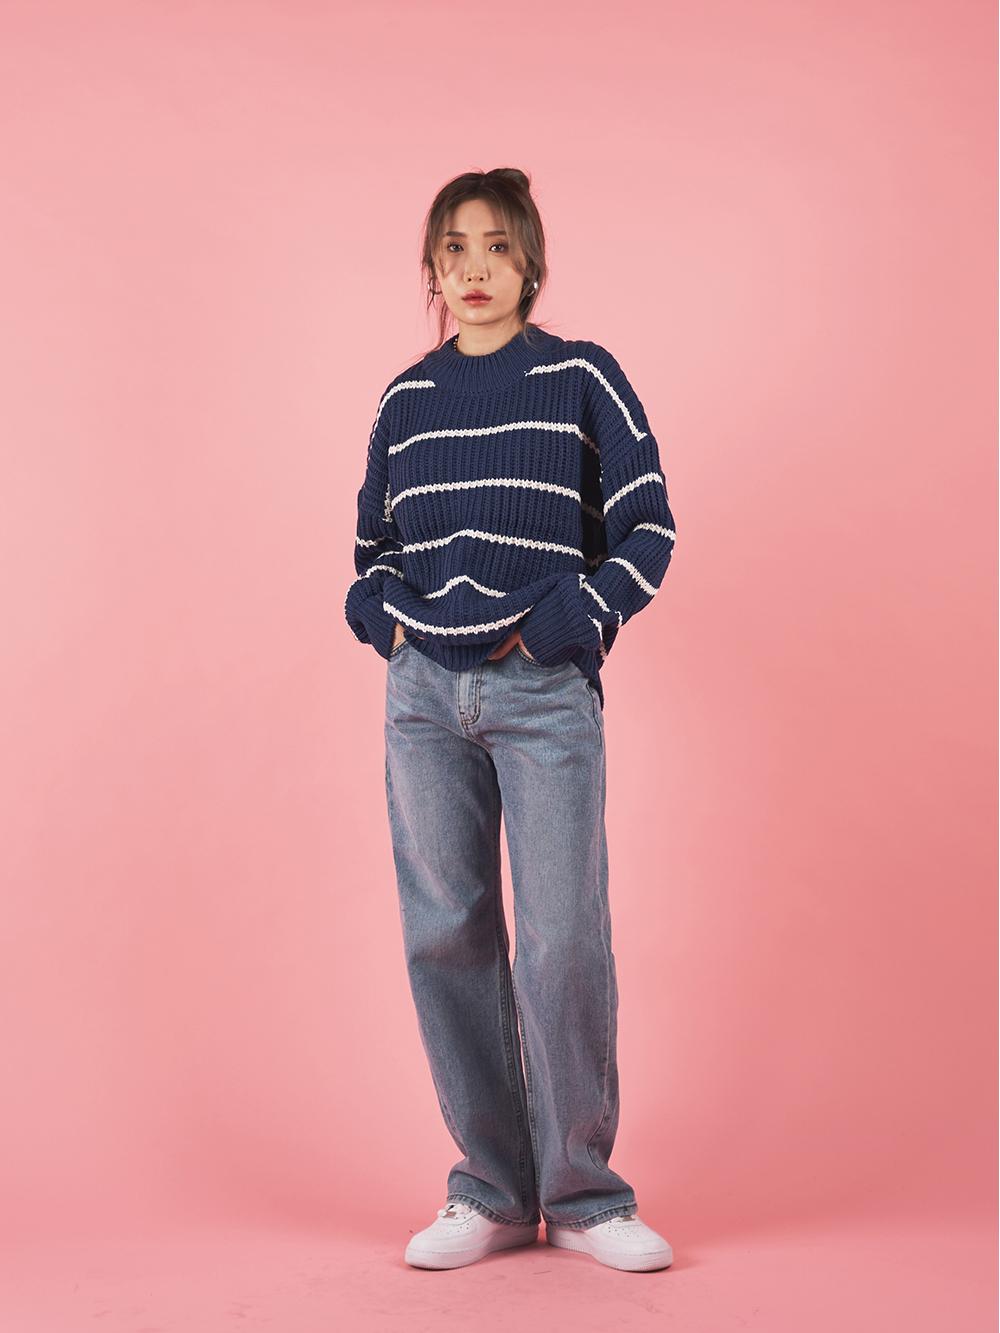 Old vintage denim trousers